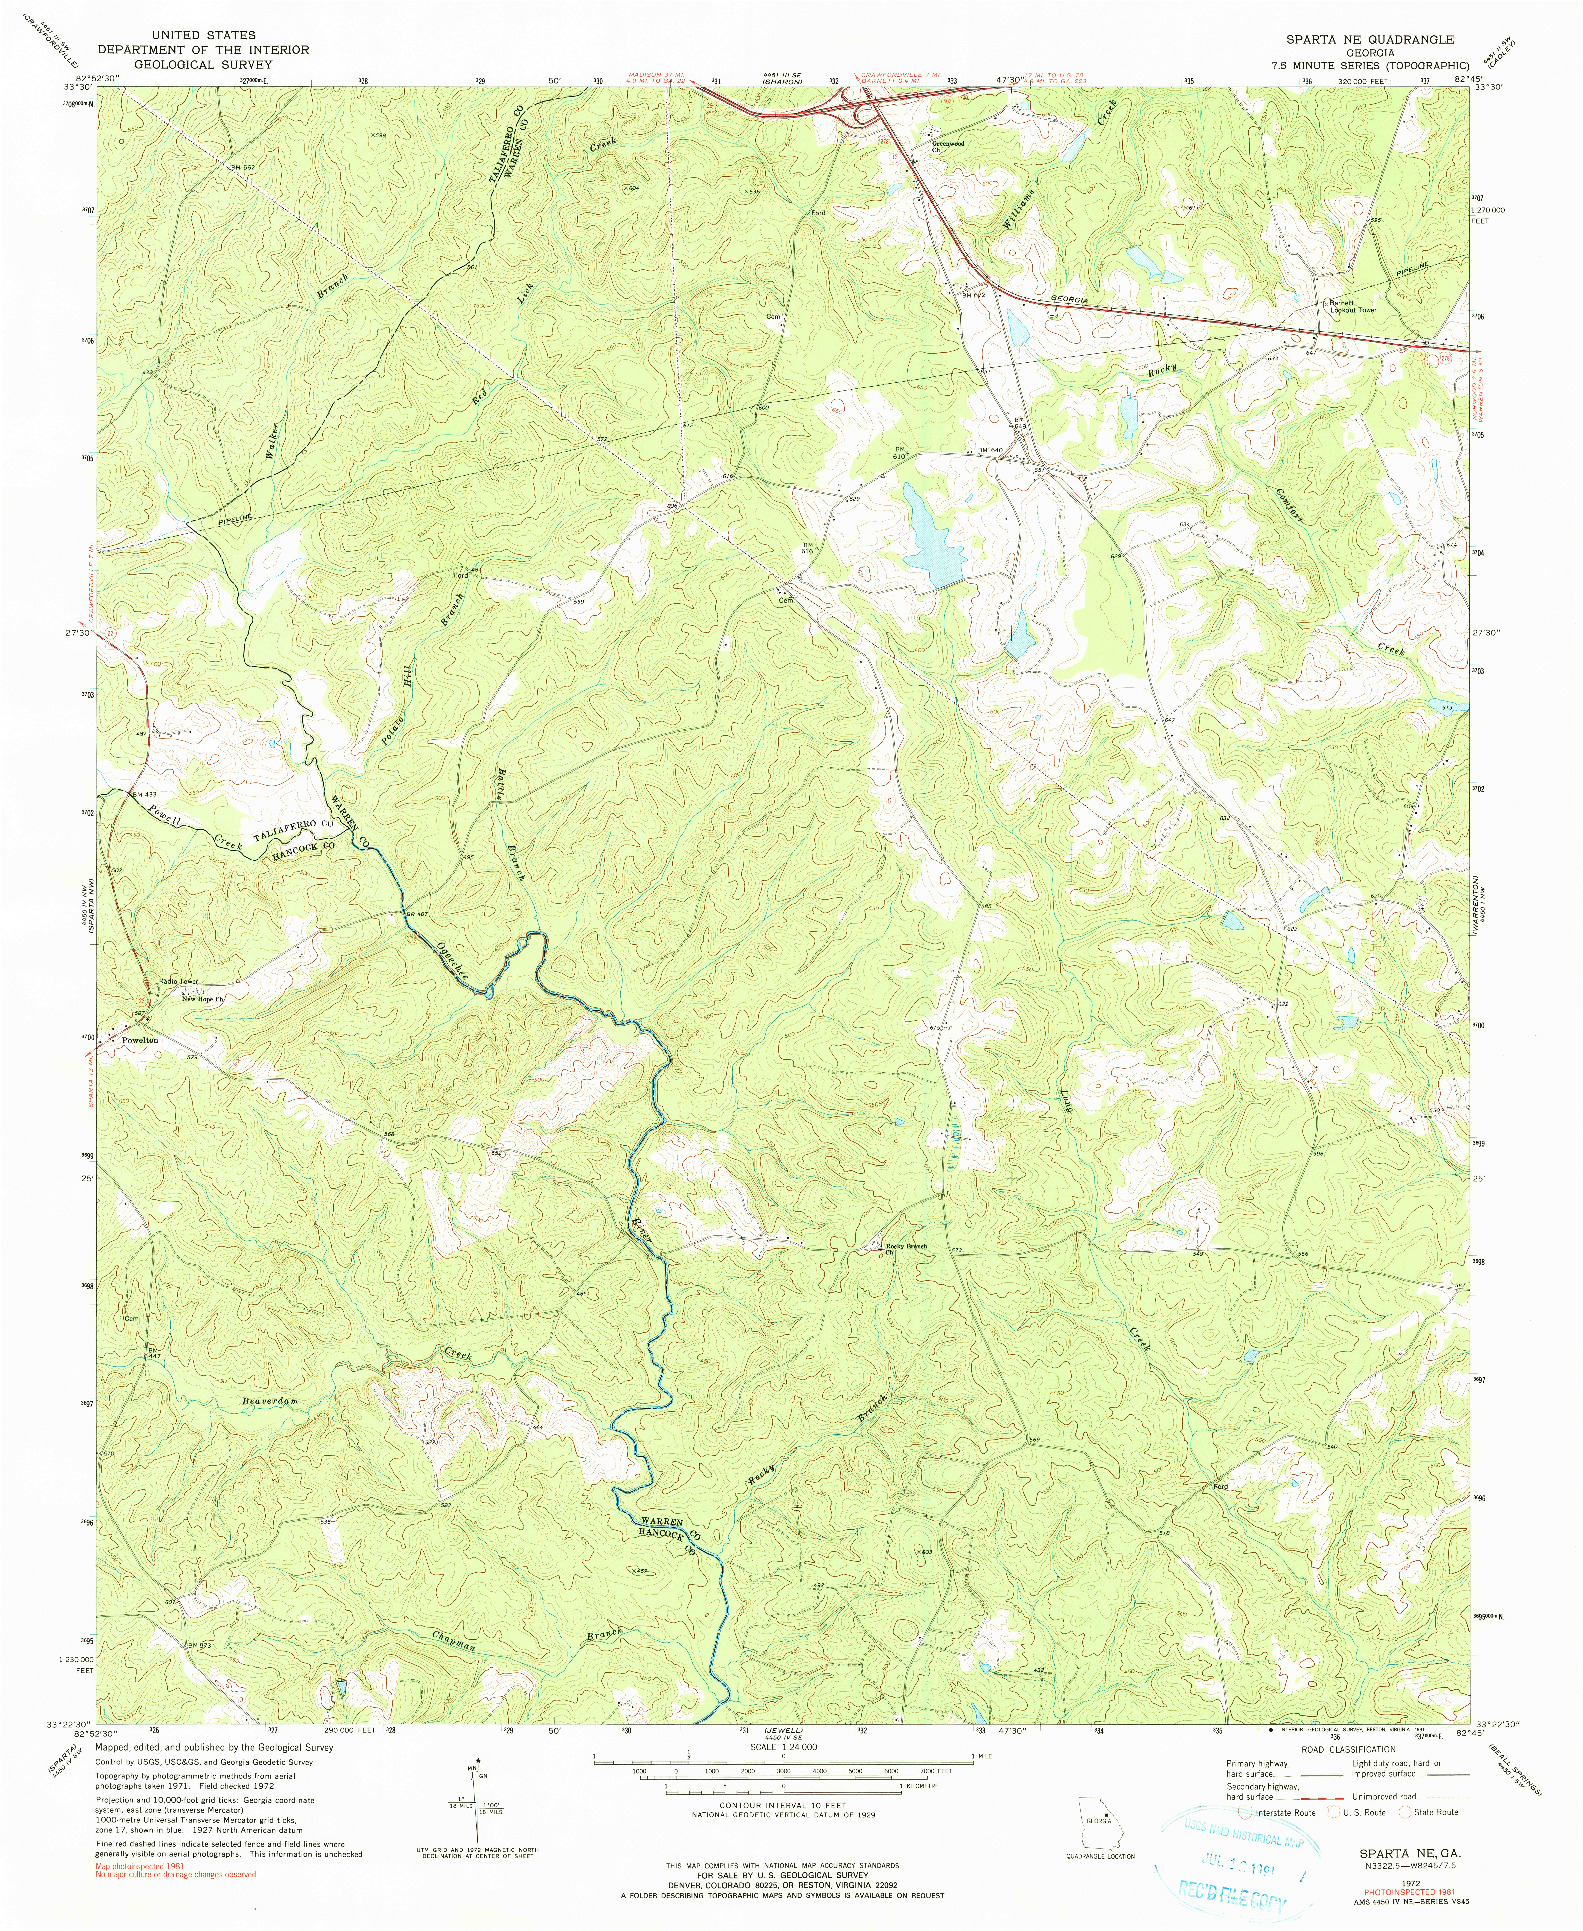 USGS 1:24000-SCALE QUADRANGLE FOR SPARTA NE, GA 1972